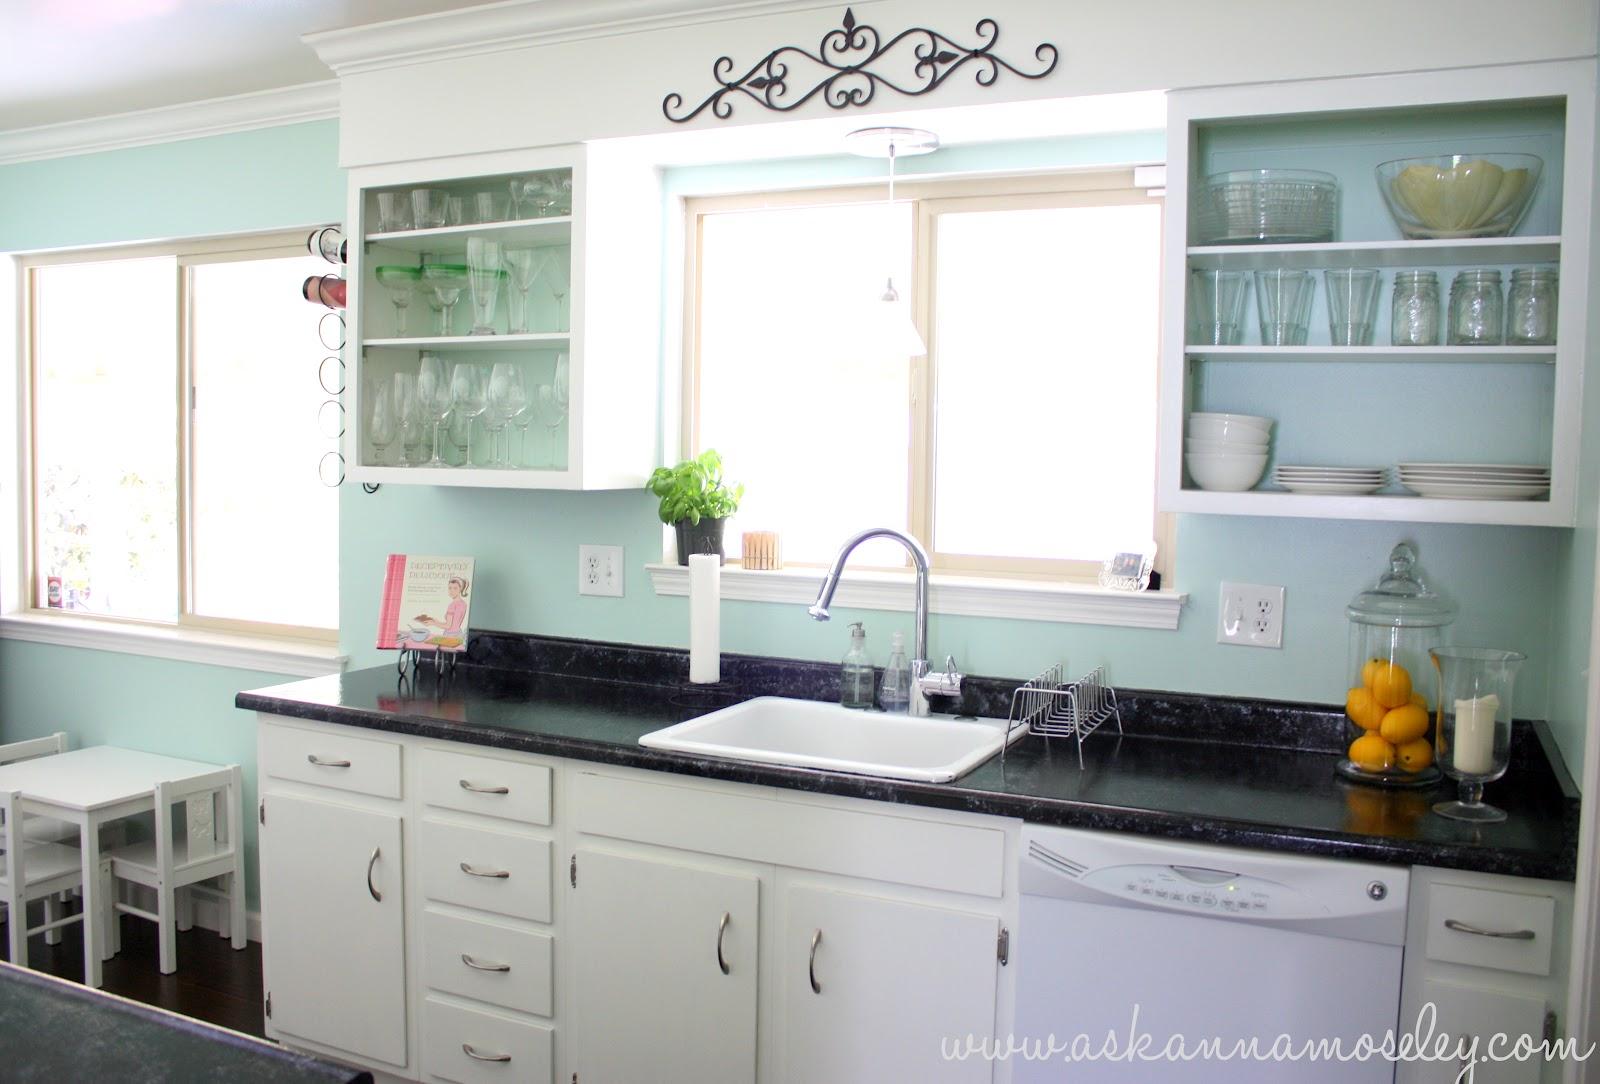 Giani Granite Countertop Paint Review - Ask Anna